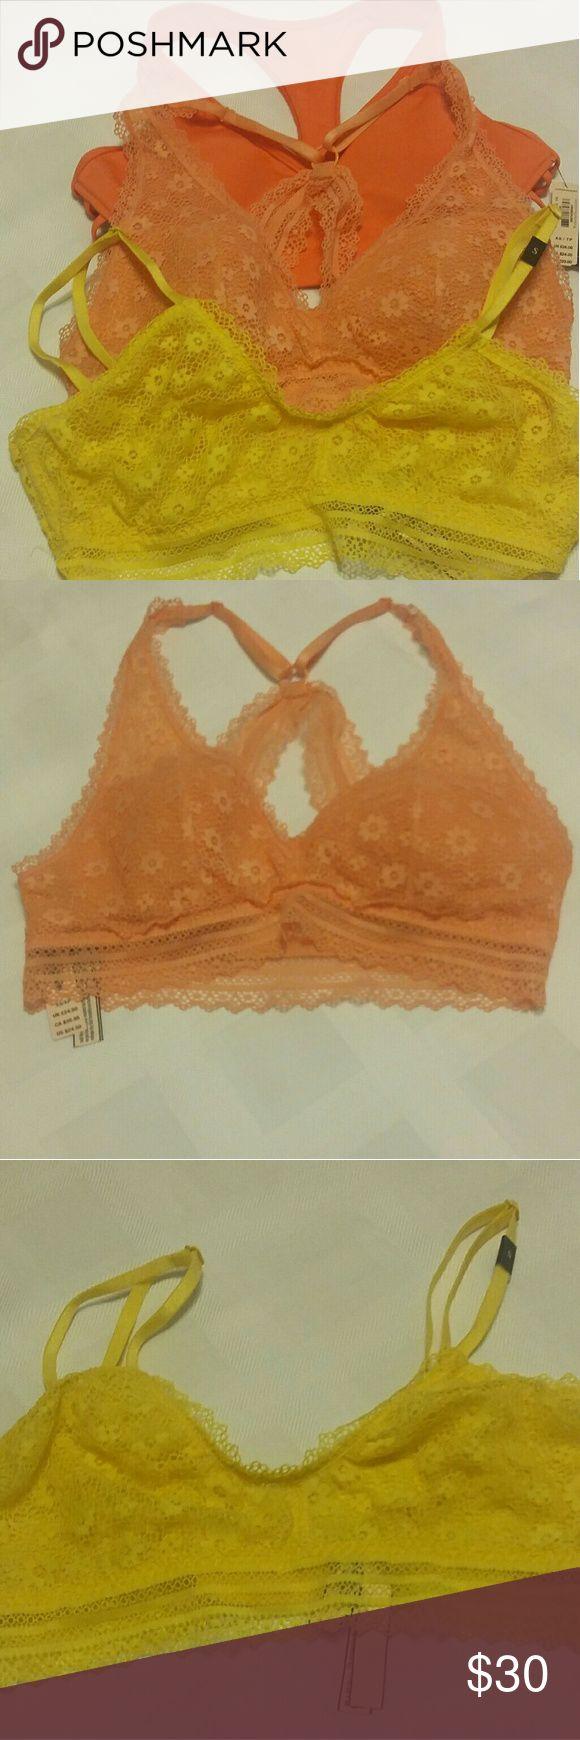 Bras Victoria Secret bras, one orange,  one yellow size s/p/ch 100% polyester and elastane. One sports bra orange size extra small /tees petite  (body-wick keeps you cool & dry. Victoria Secret Intimates & Sleepwear Bras